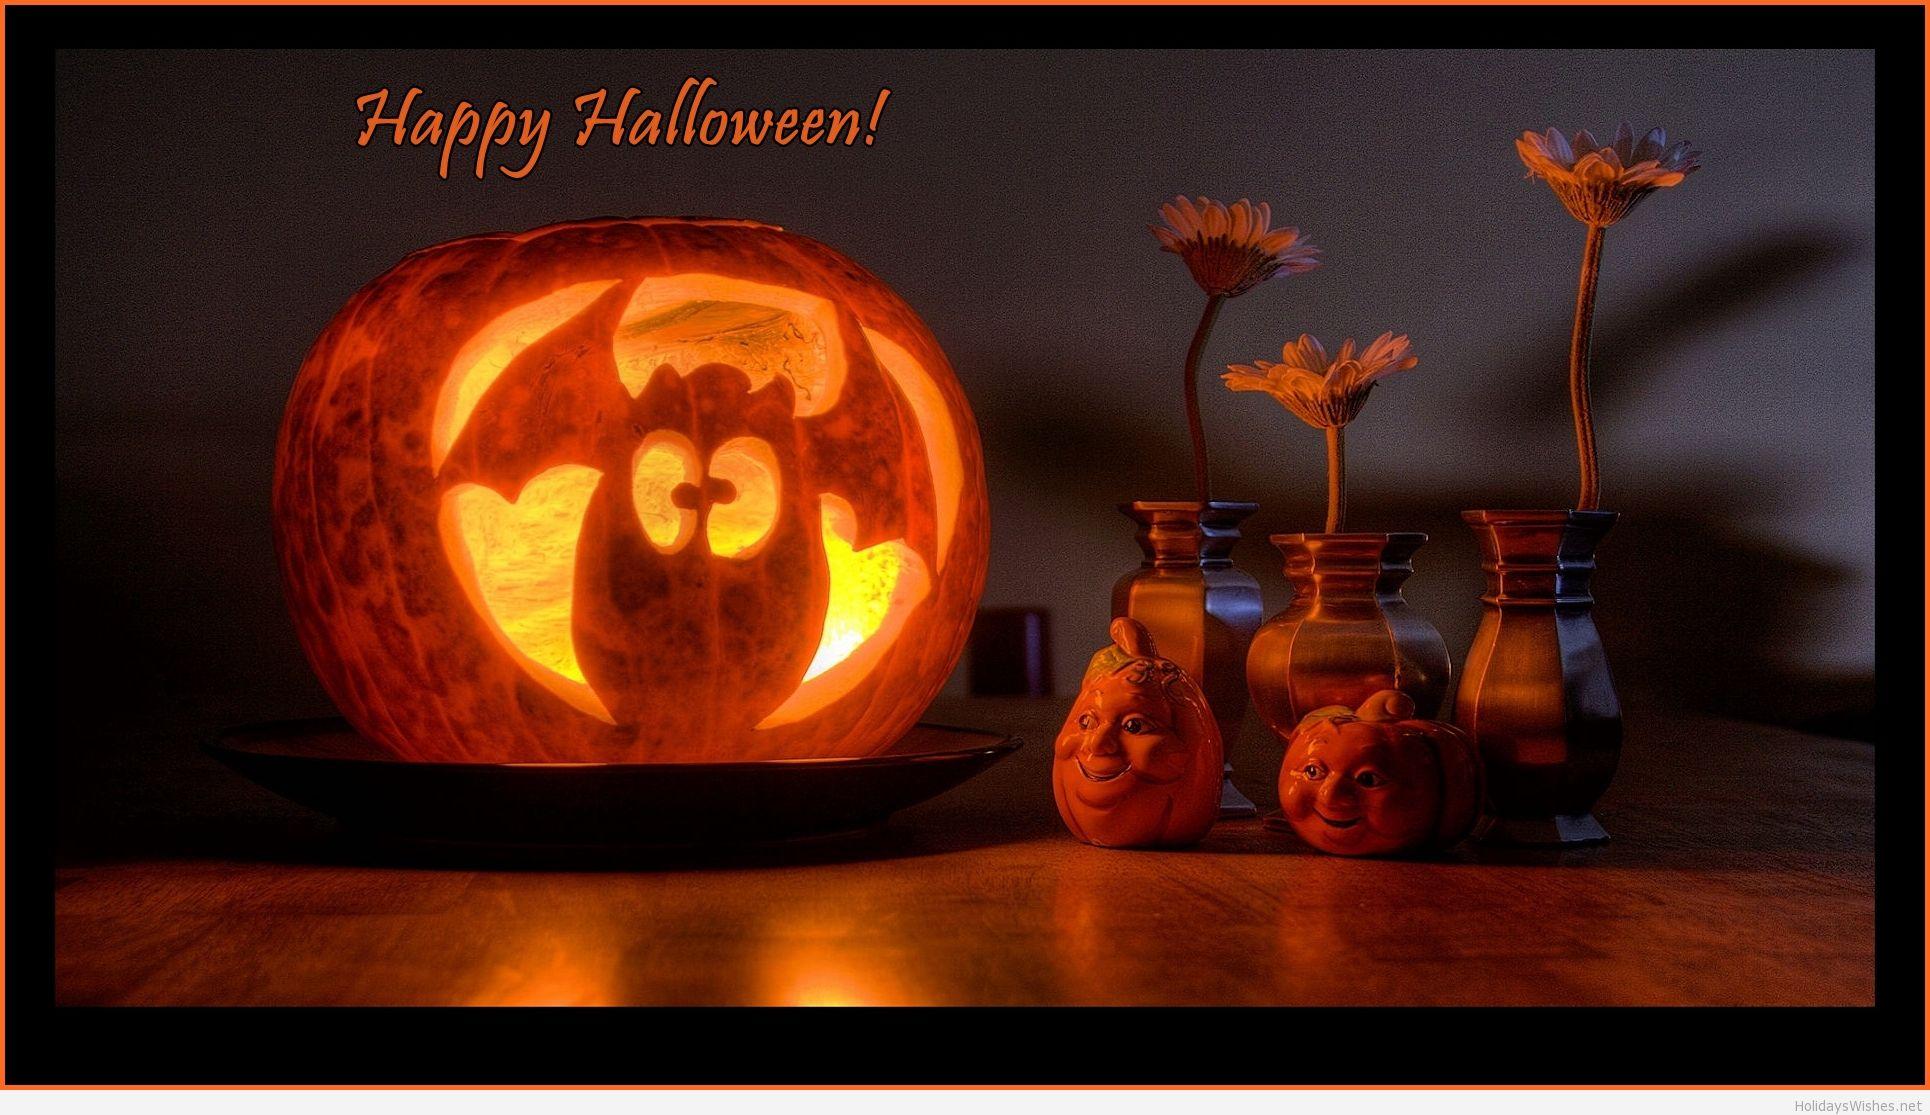 Free Animated Halloween Desktop Wallpaper 60 Happy Halloween Images Pictures And Wallpapers